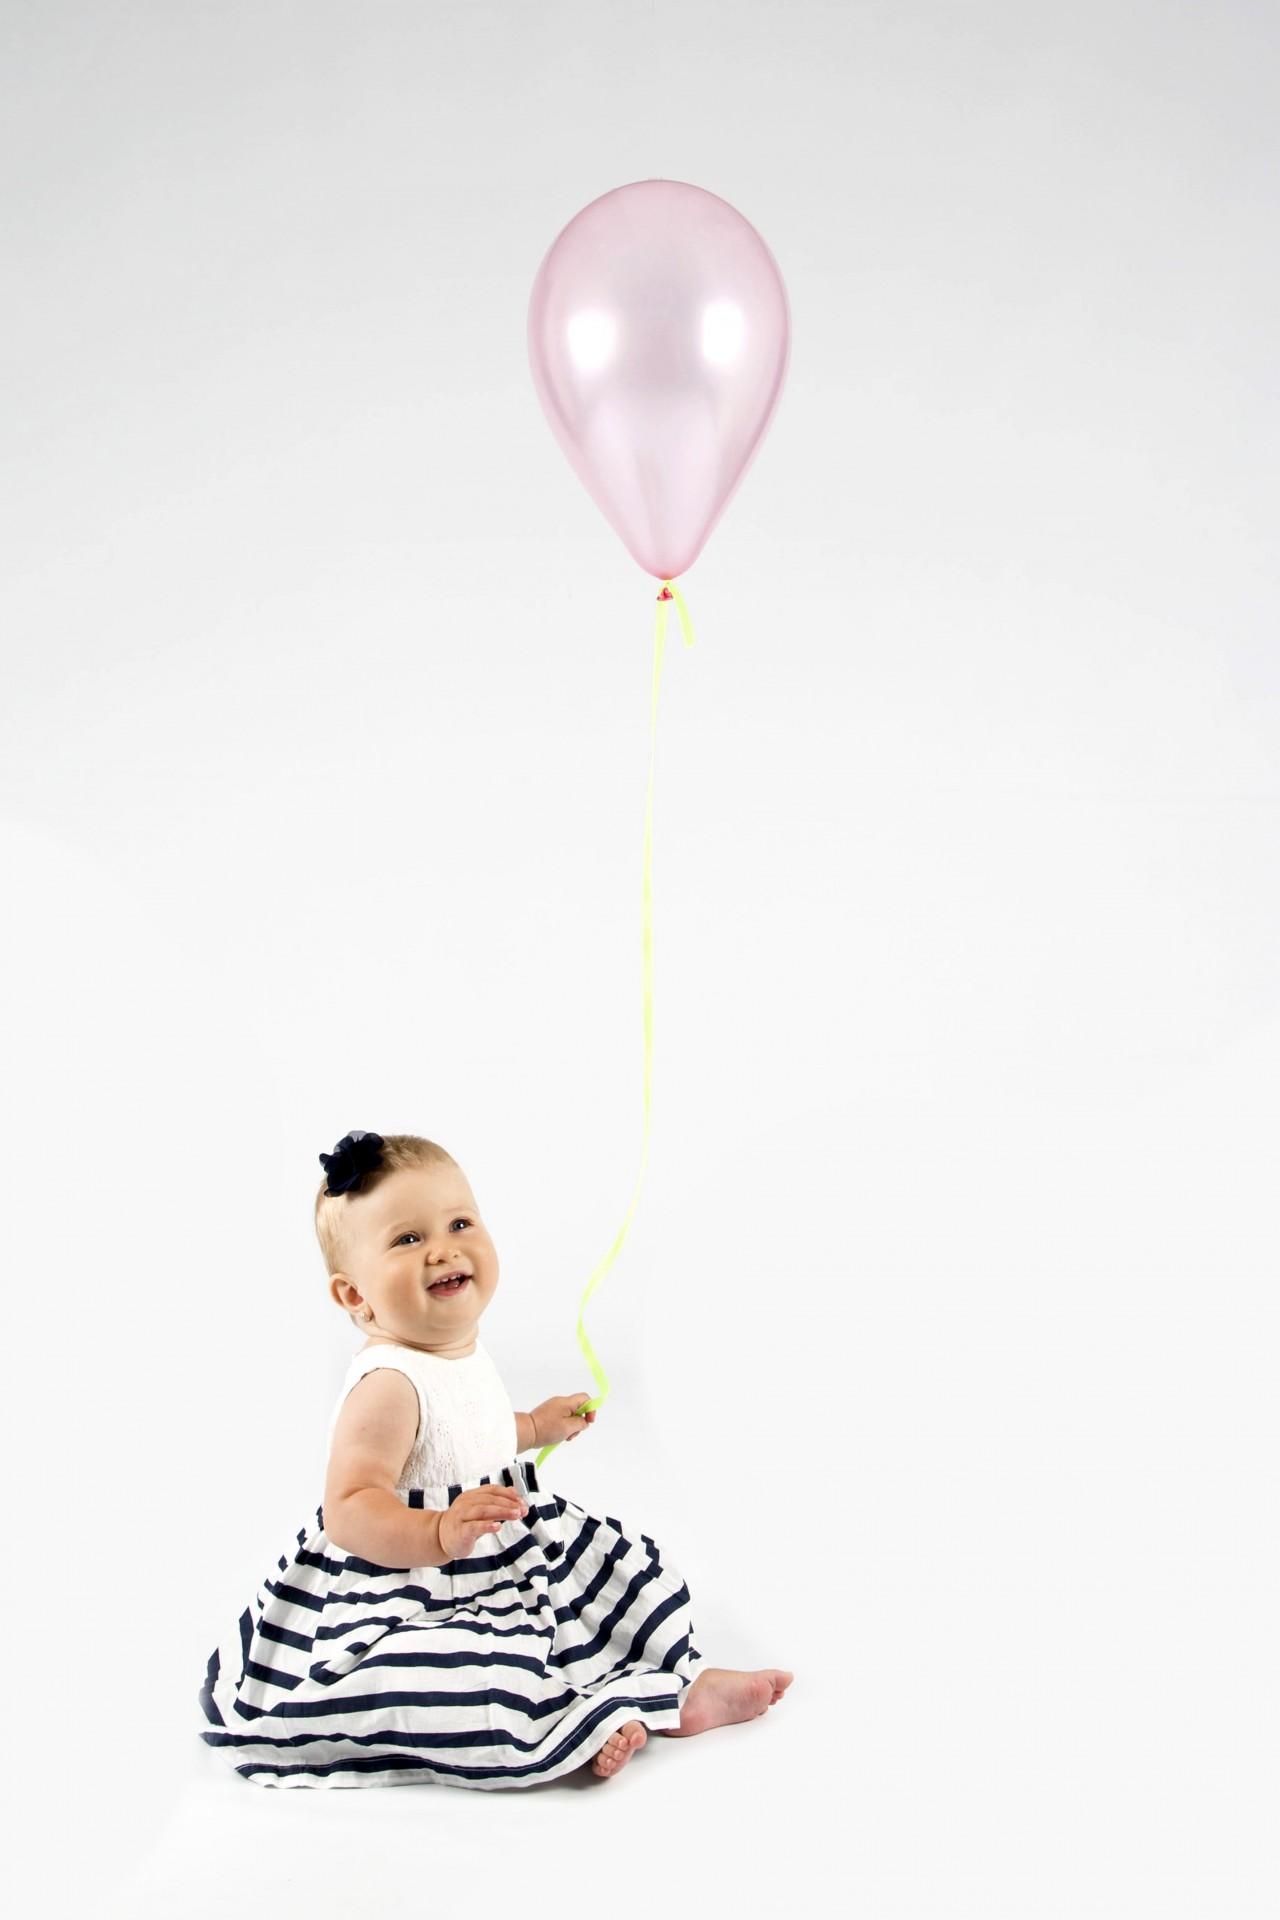 Baby Girl Holding Balloon Free Stock Photo Public Domain